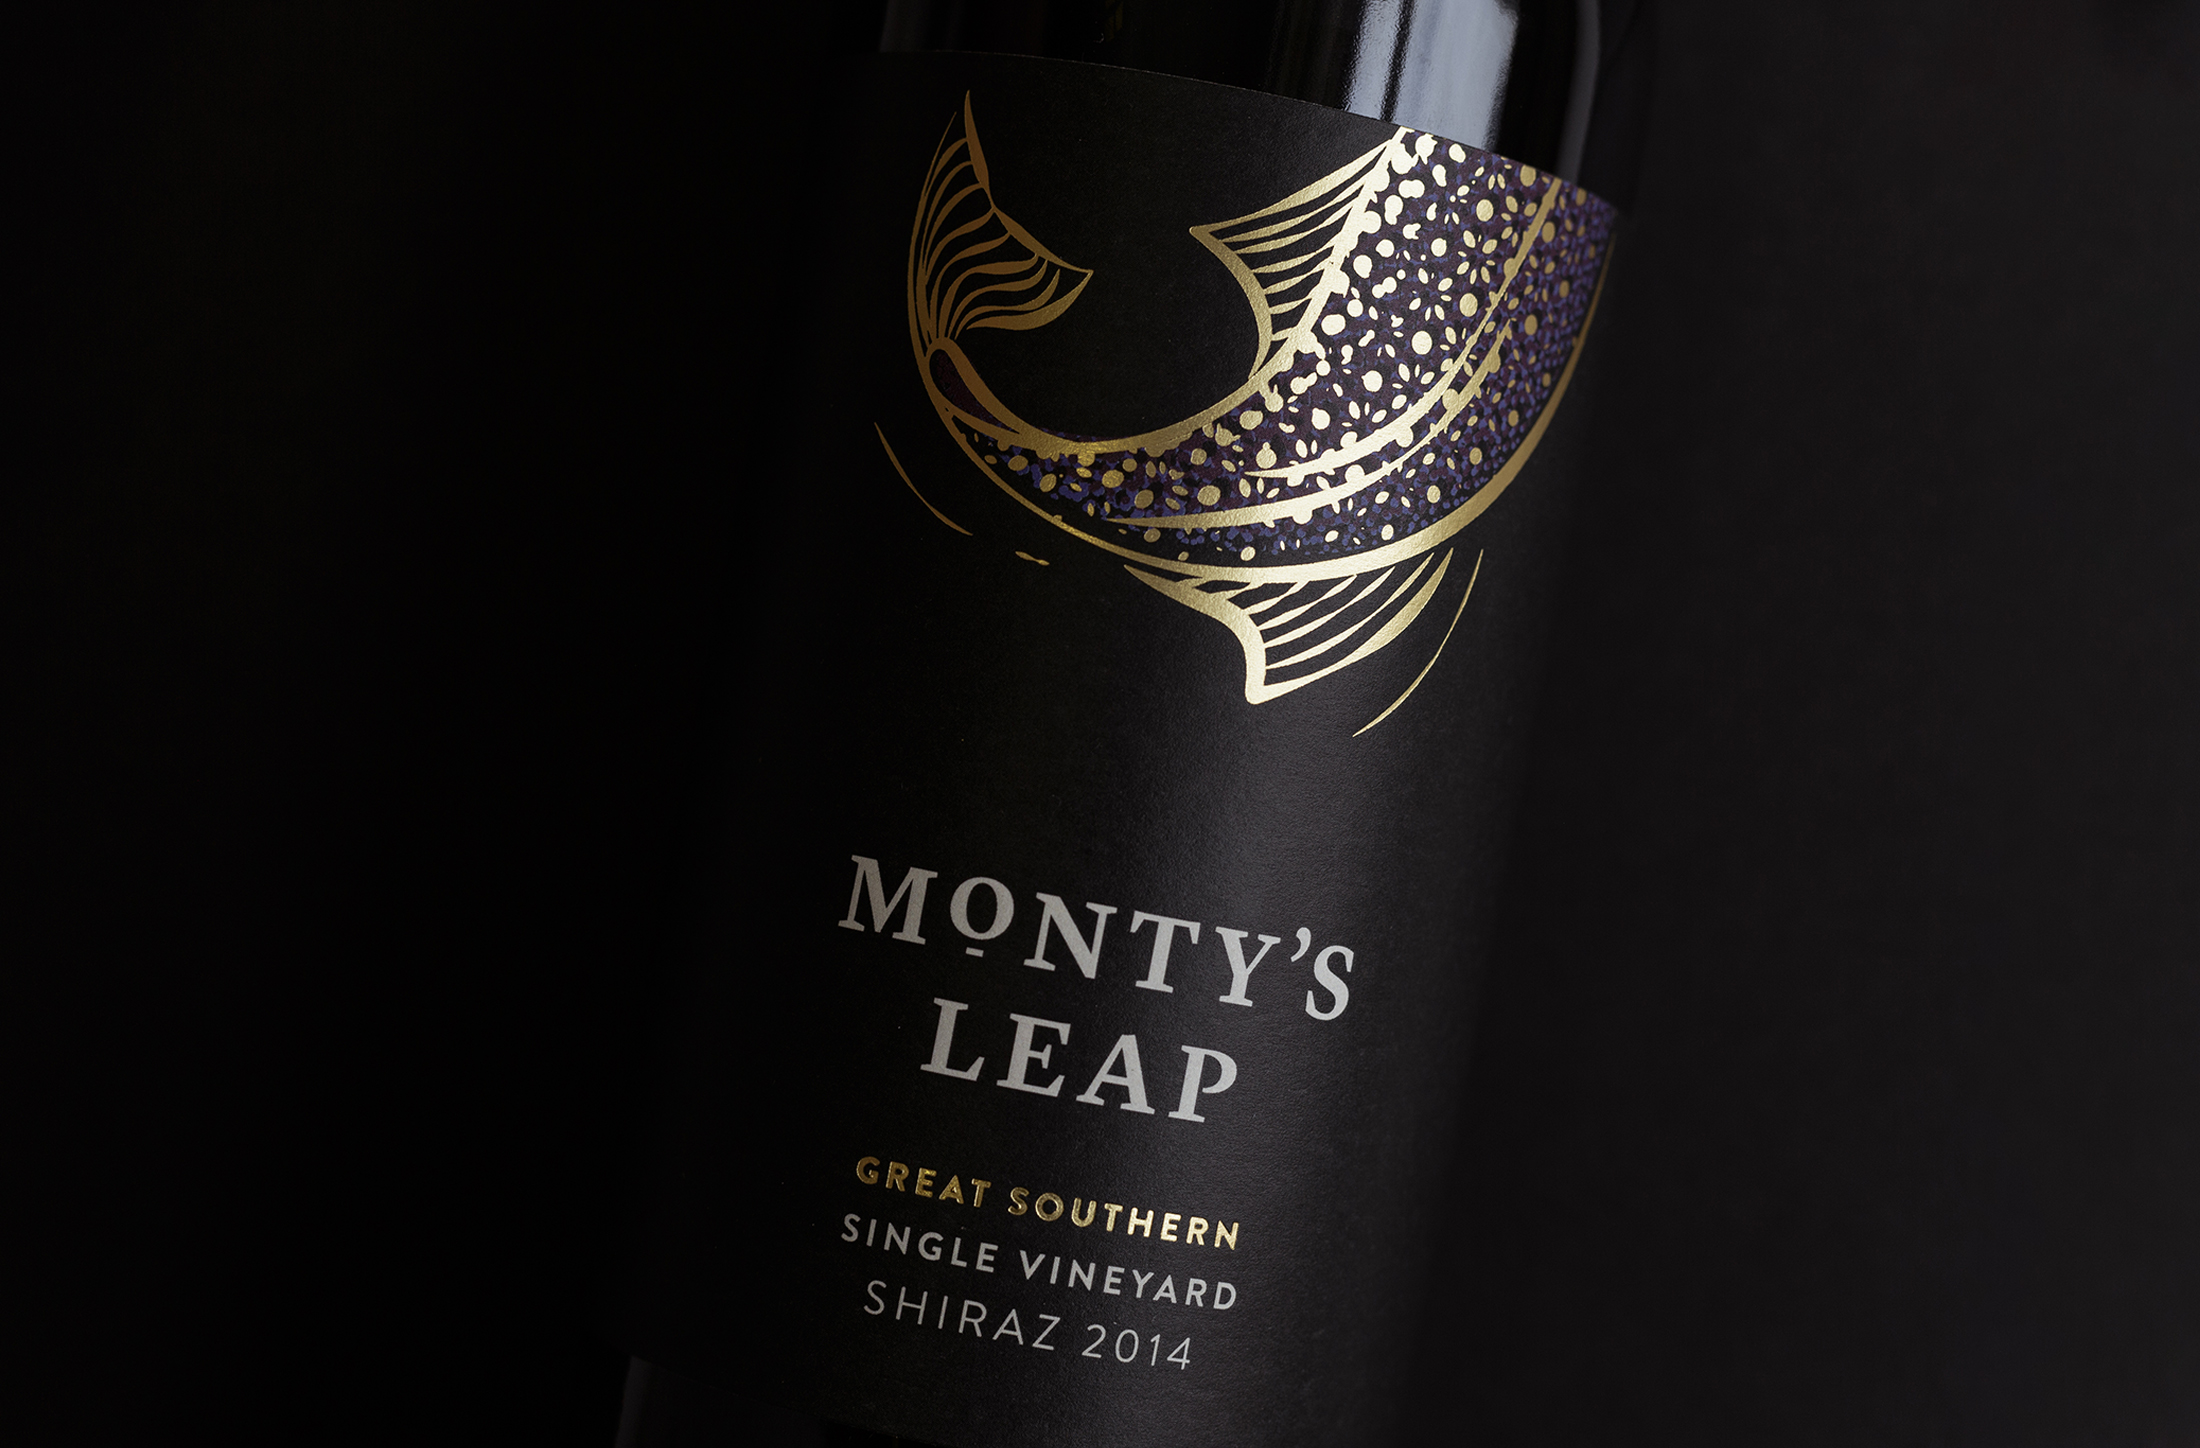 Monty's Leap - Premium Shiraz